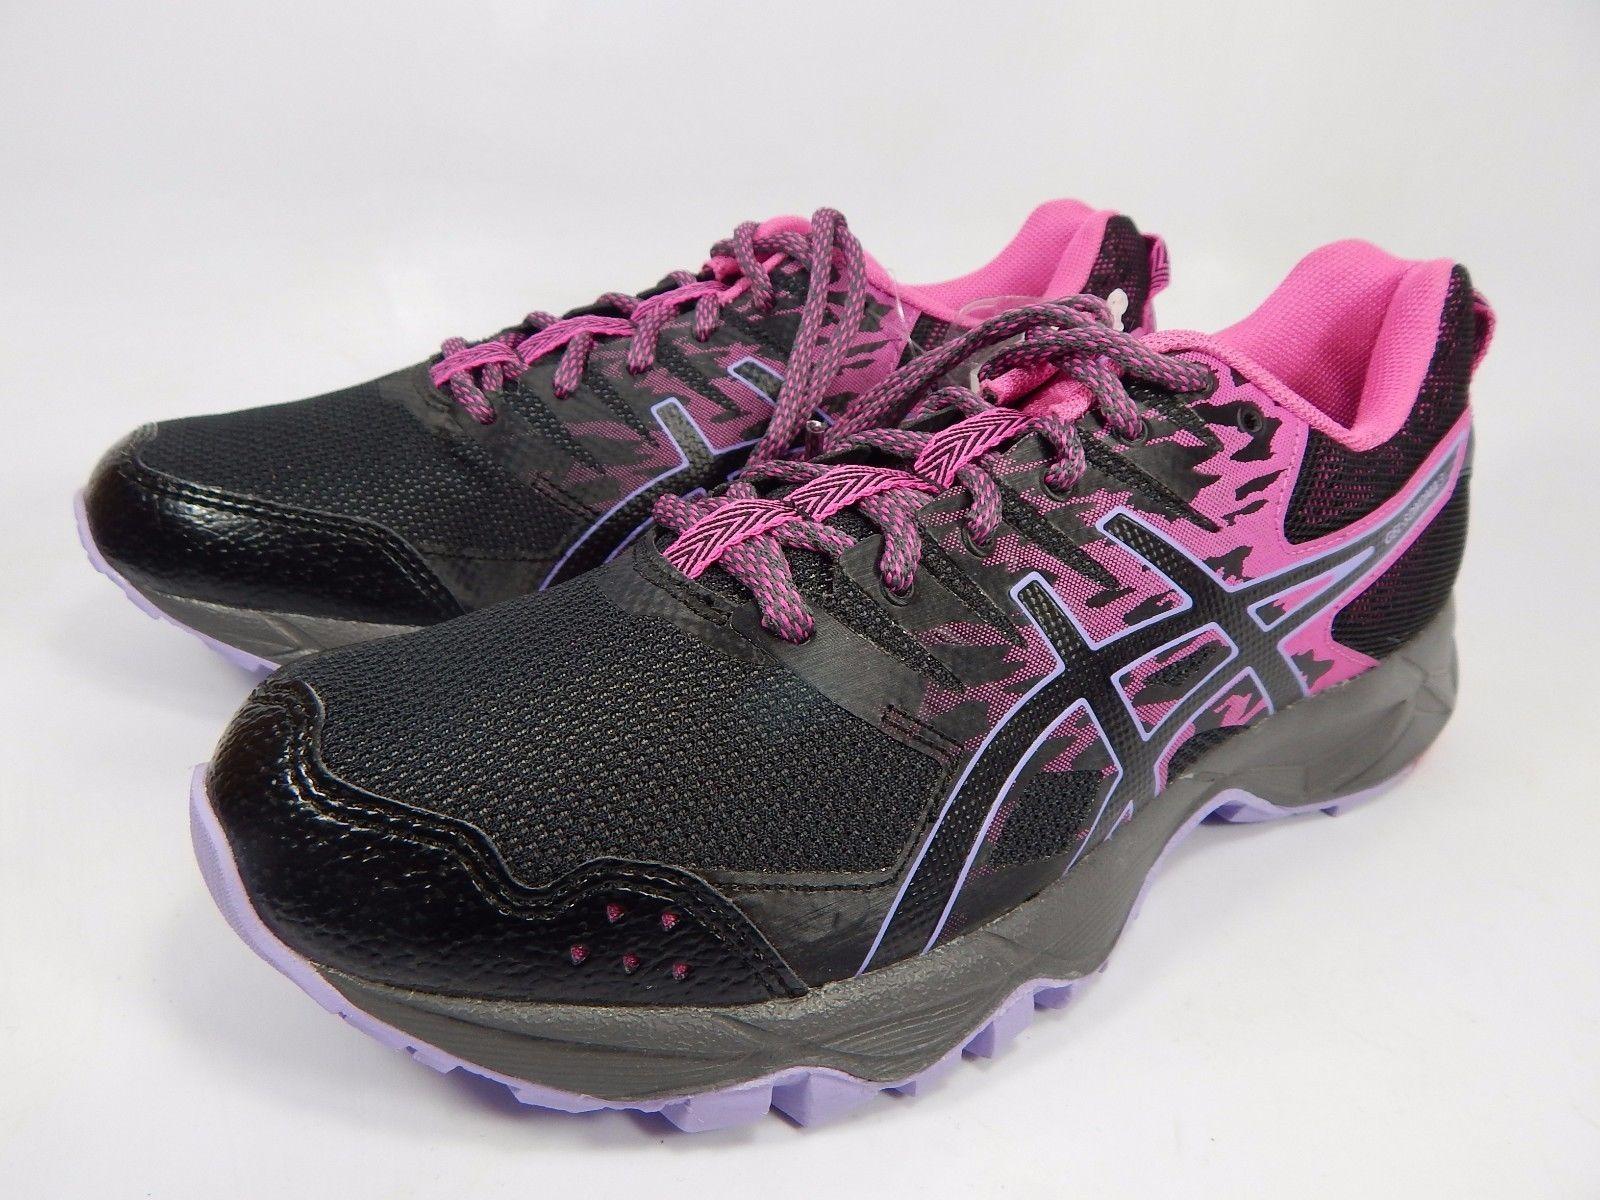 Asics Gel Sonoma 3 Women's Trail Running Shoes Size US 7 M (B) EU 38 Black T774N